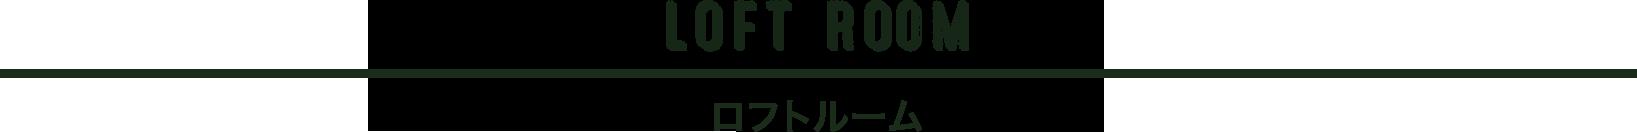 loftroom_m